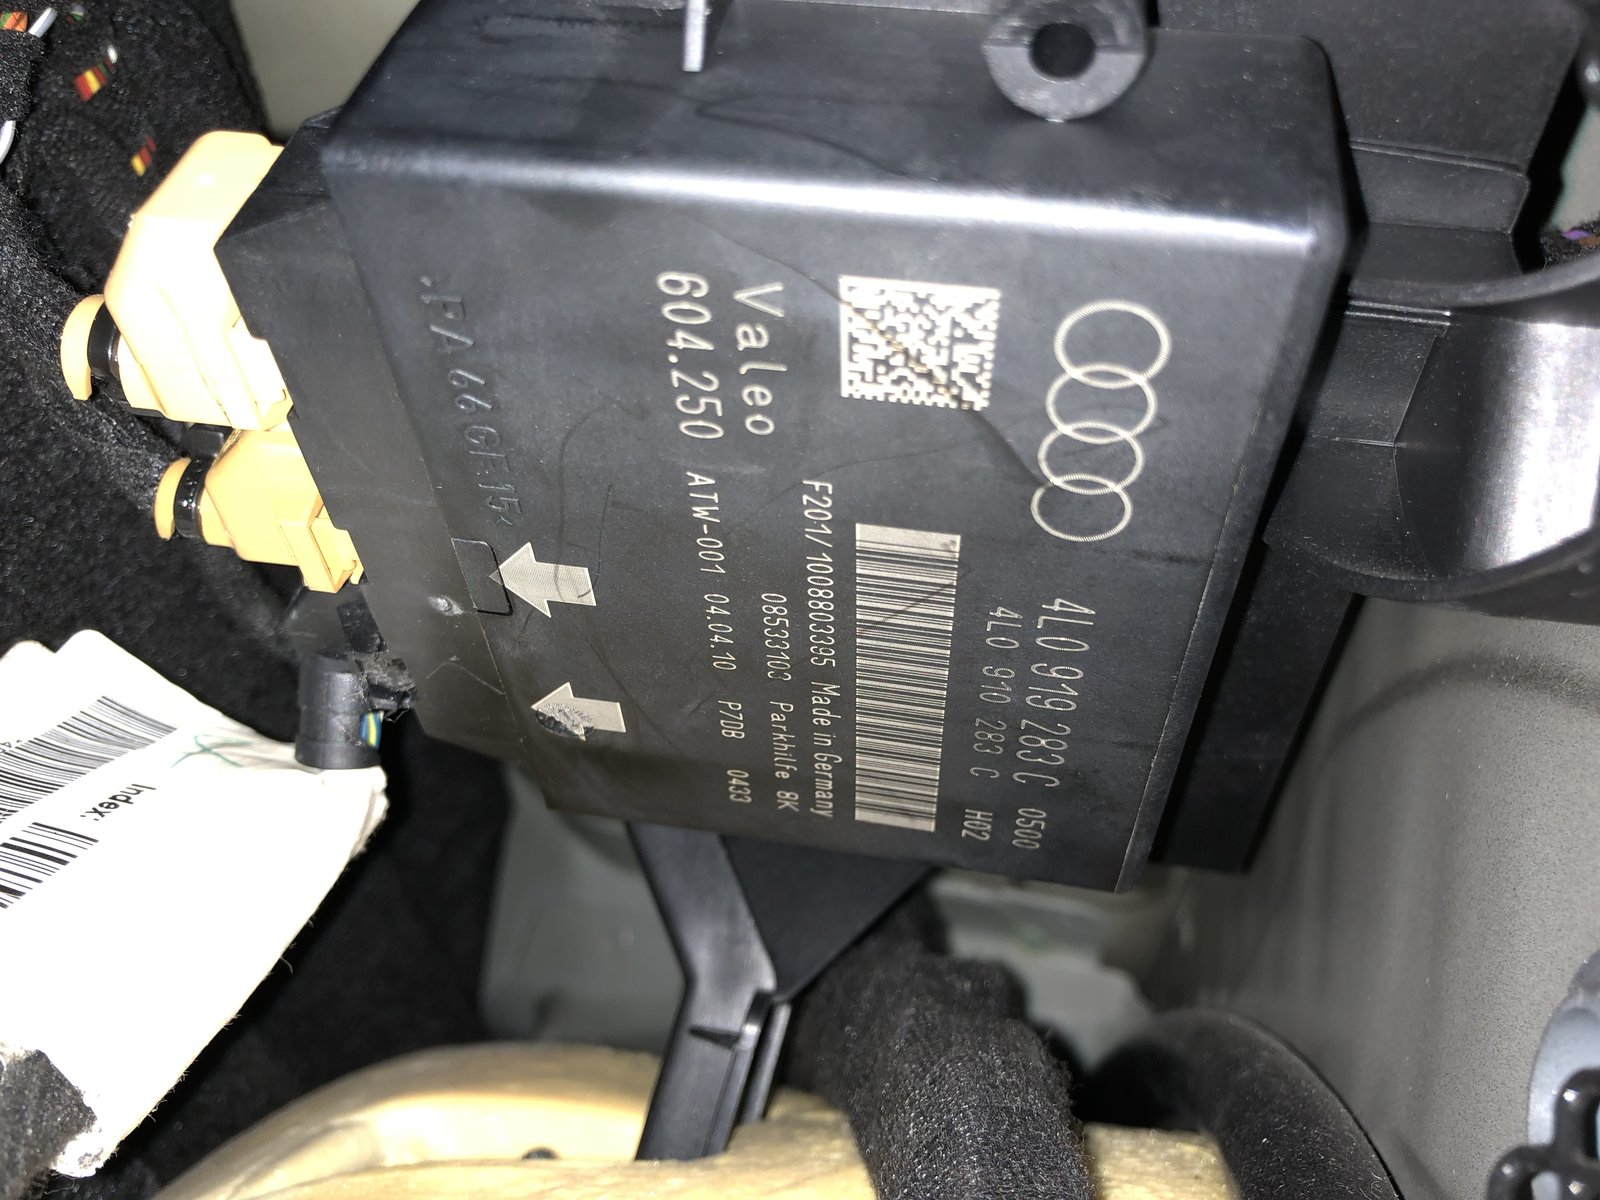 B12582E1-A594-45E1-A592-4CB4034ECCAC.jpeg